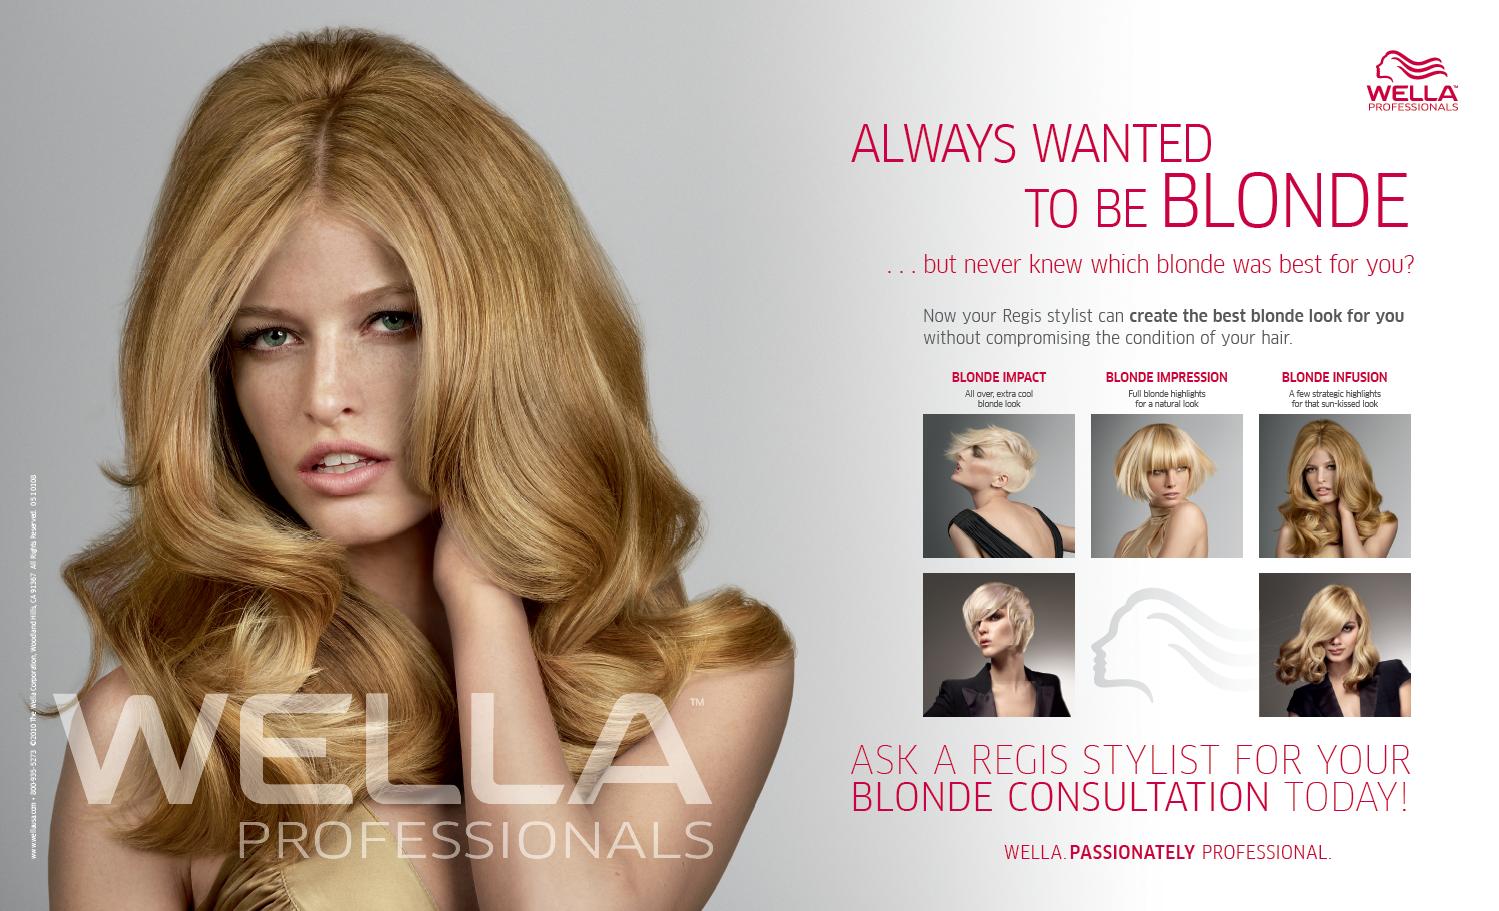 wella-blondor-bleach-powder-the-the-glamour-shop.png